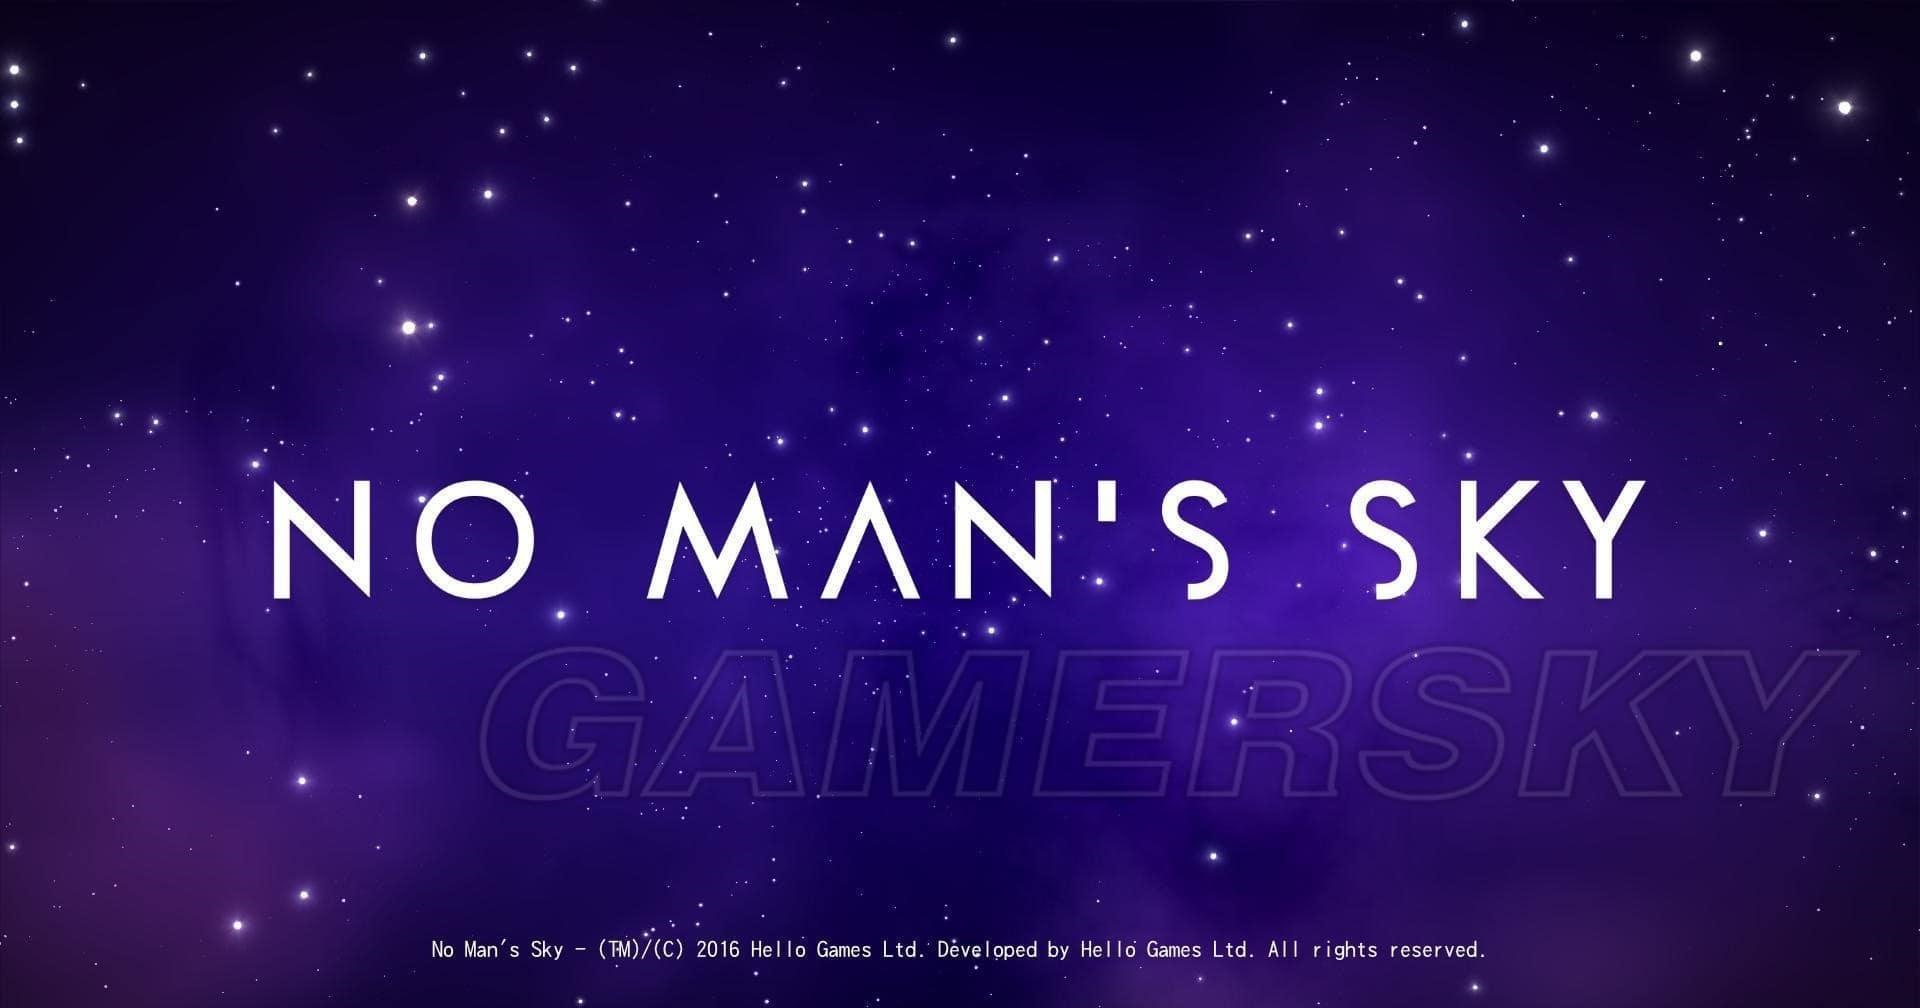 No Man's Sky 畫面物種探索及遊戲性試玩心得 No Man's Sky好玩嗎